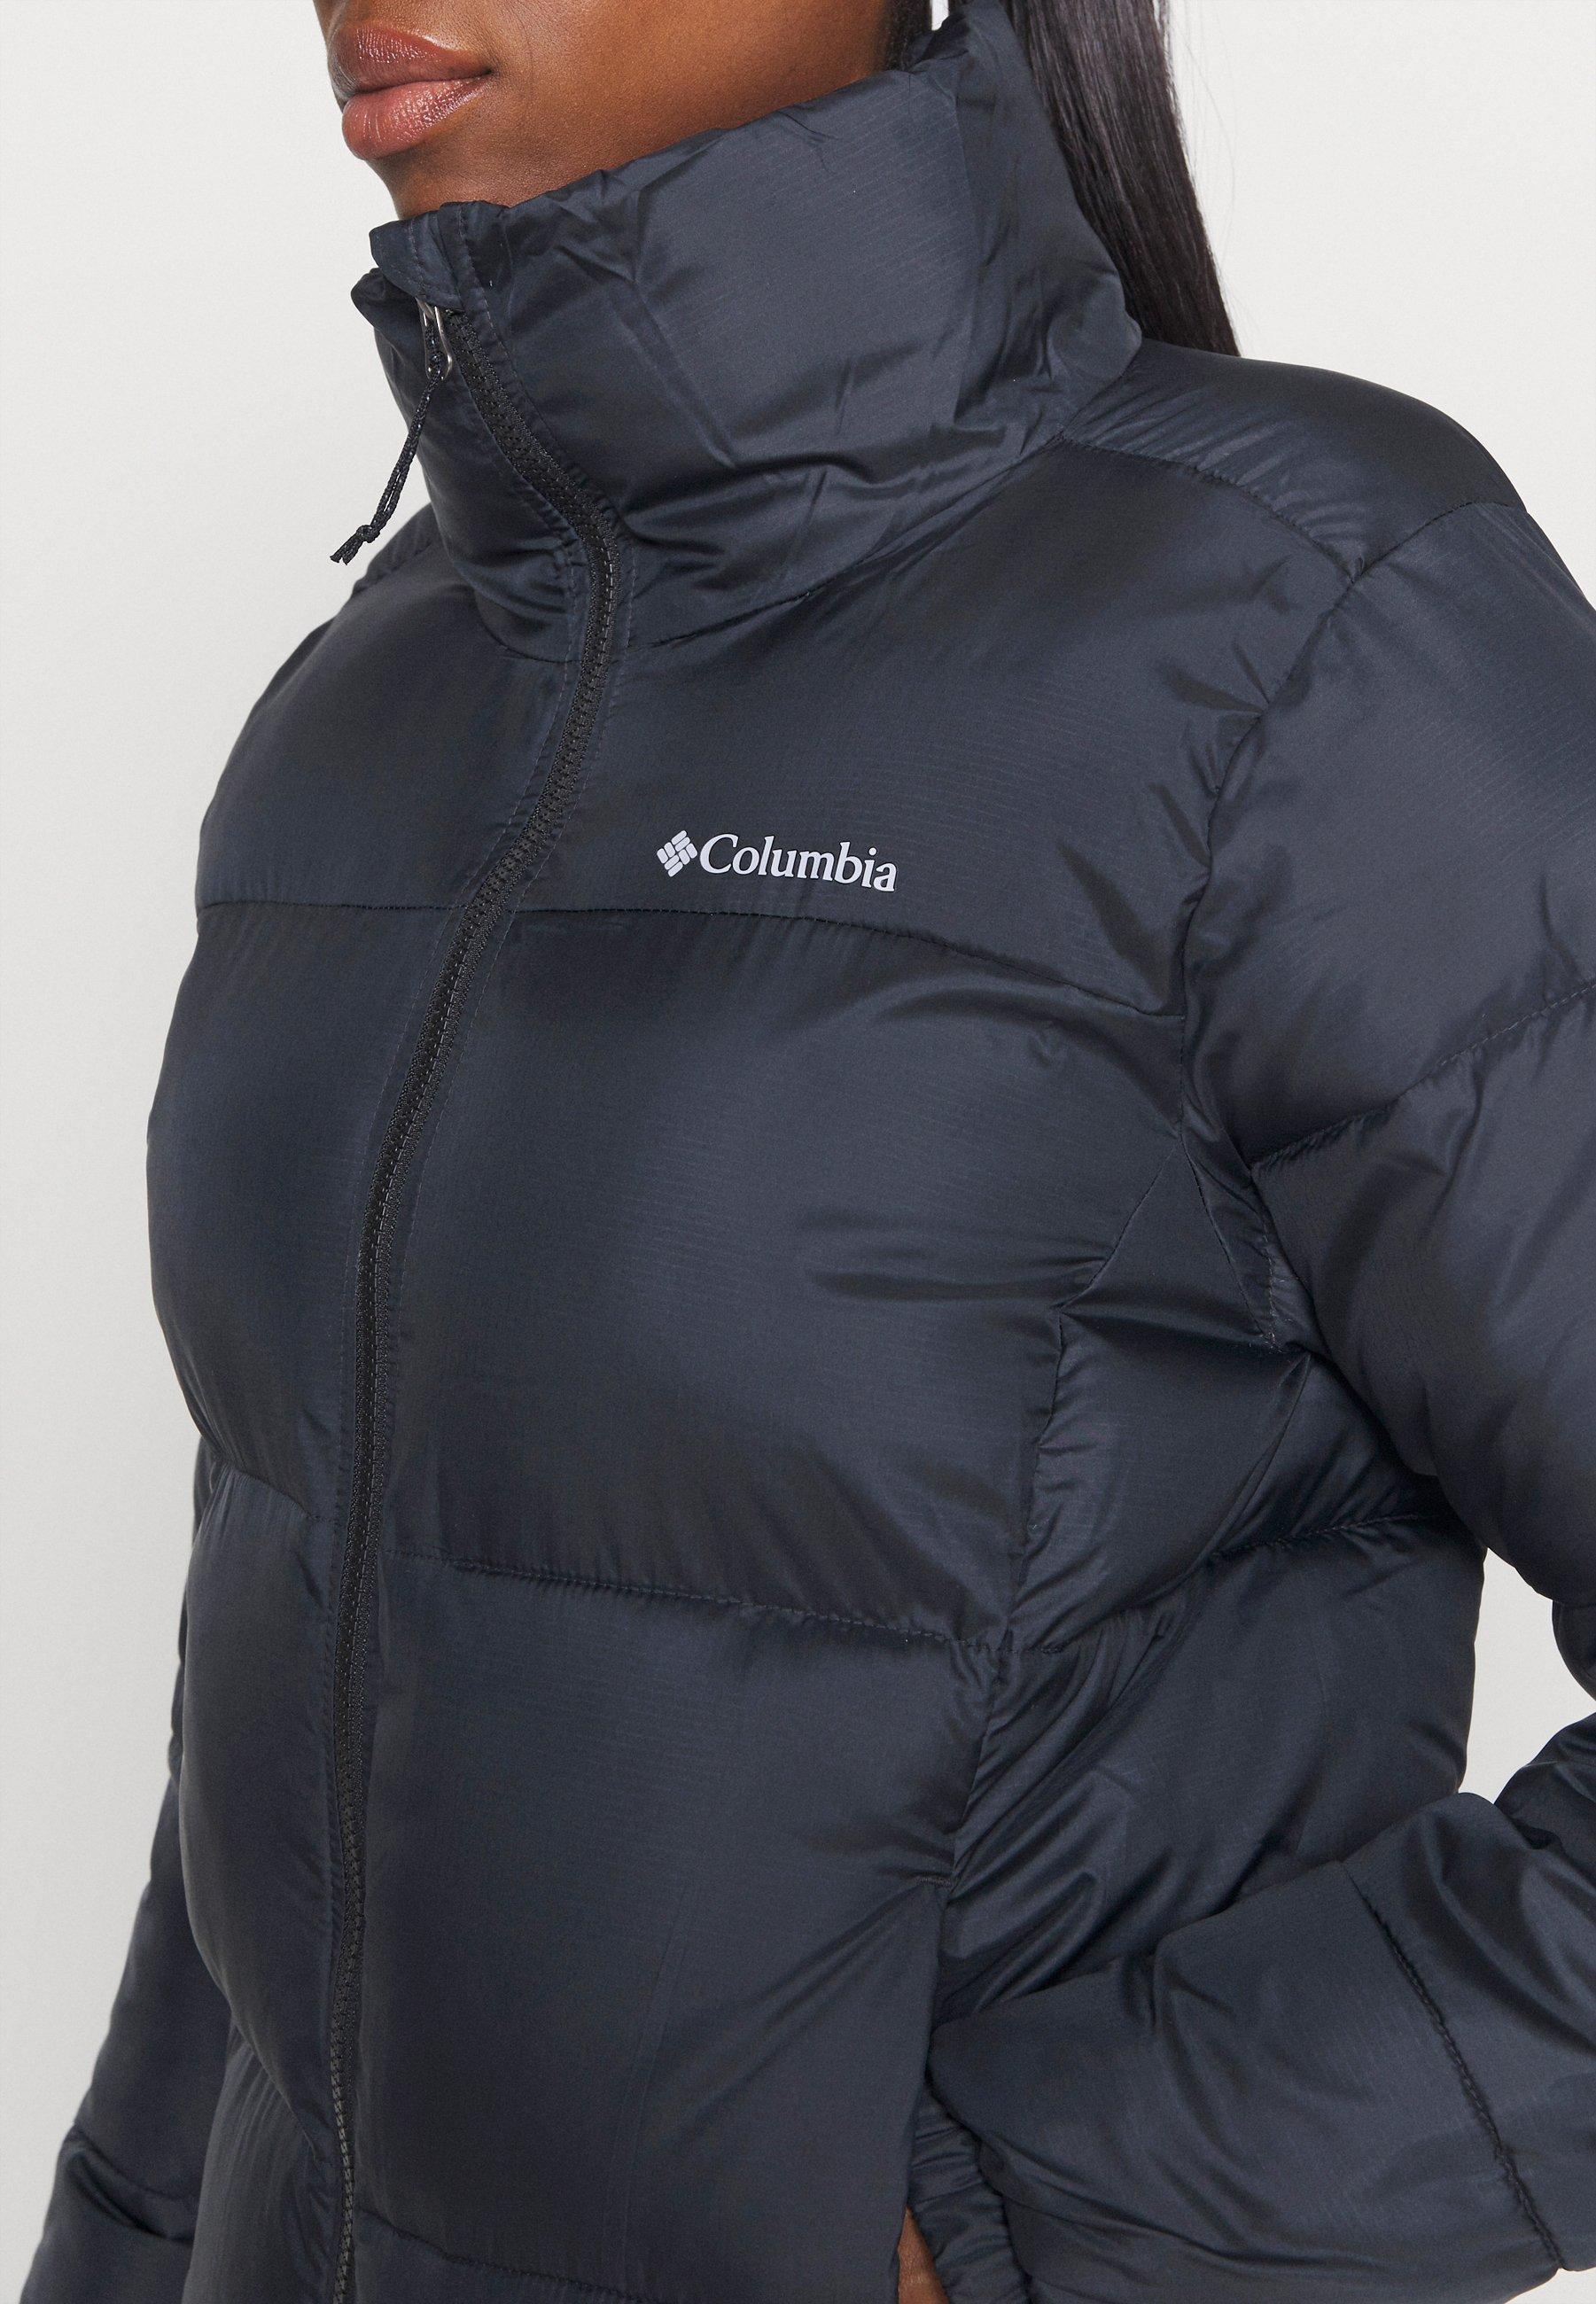 Columbia PUFFECTJACKET Vinterjacka black Zalando.se